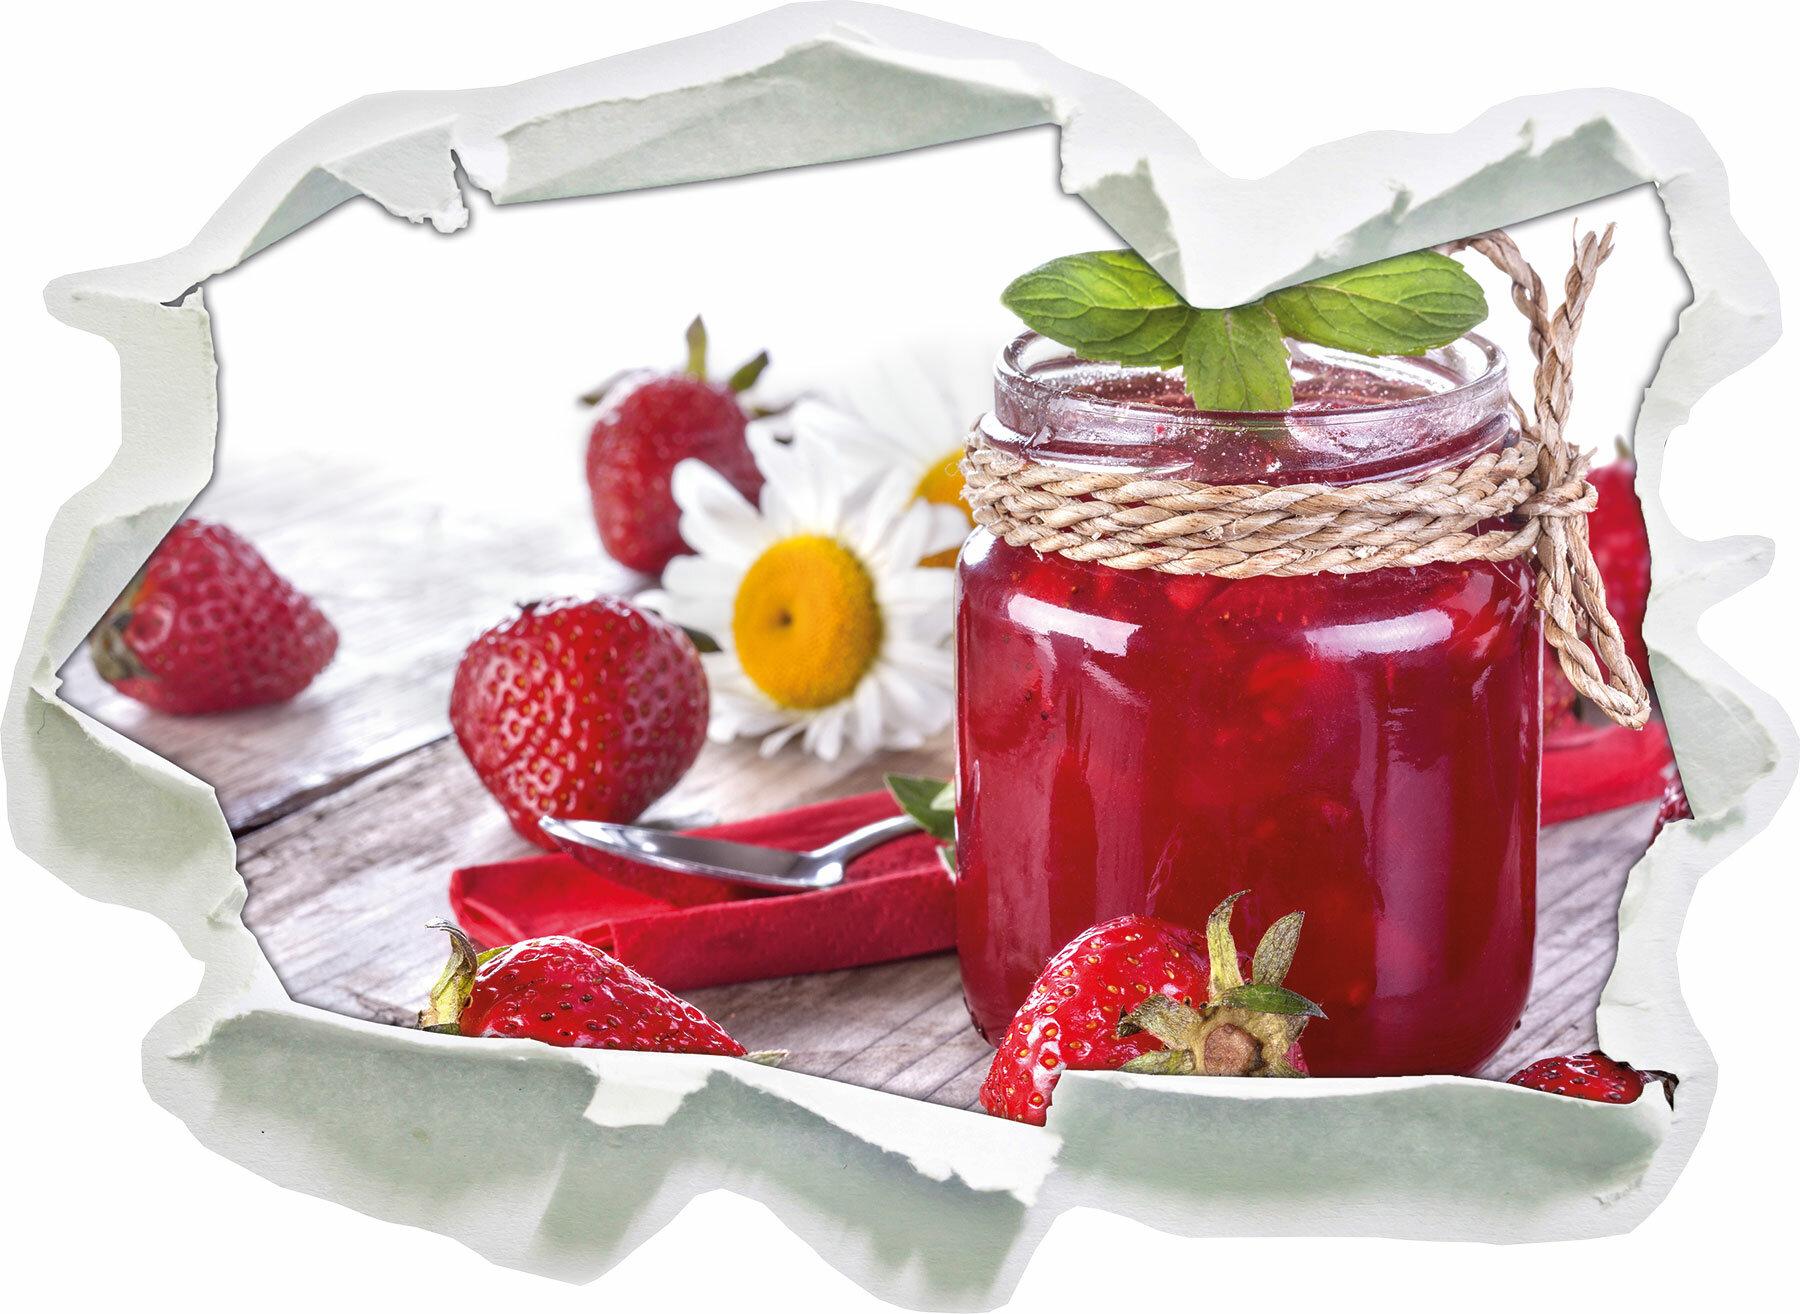 East Urban Home Wandtattoo Glas Mit Erdbeeren In Wiese Voller Klee